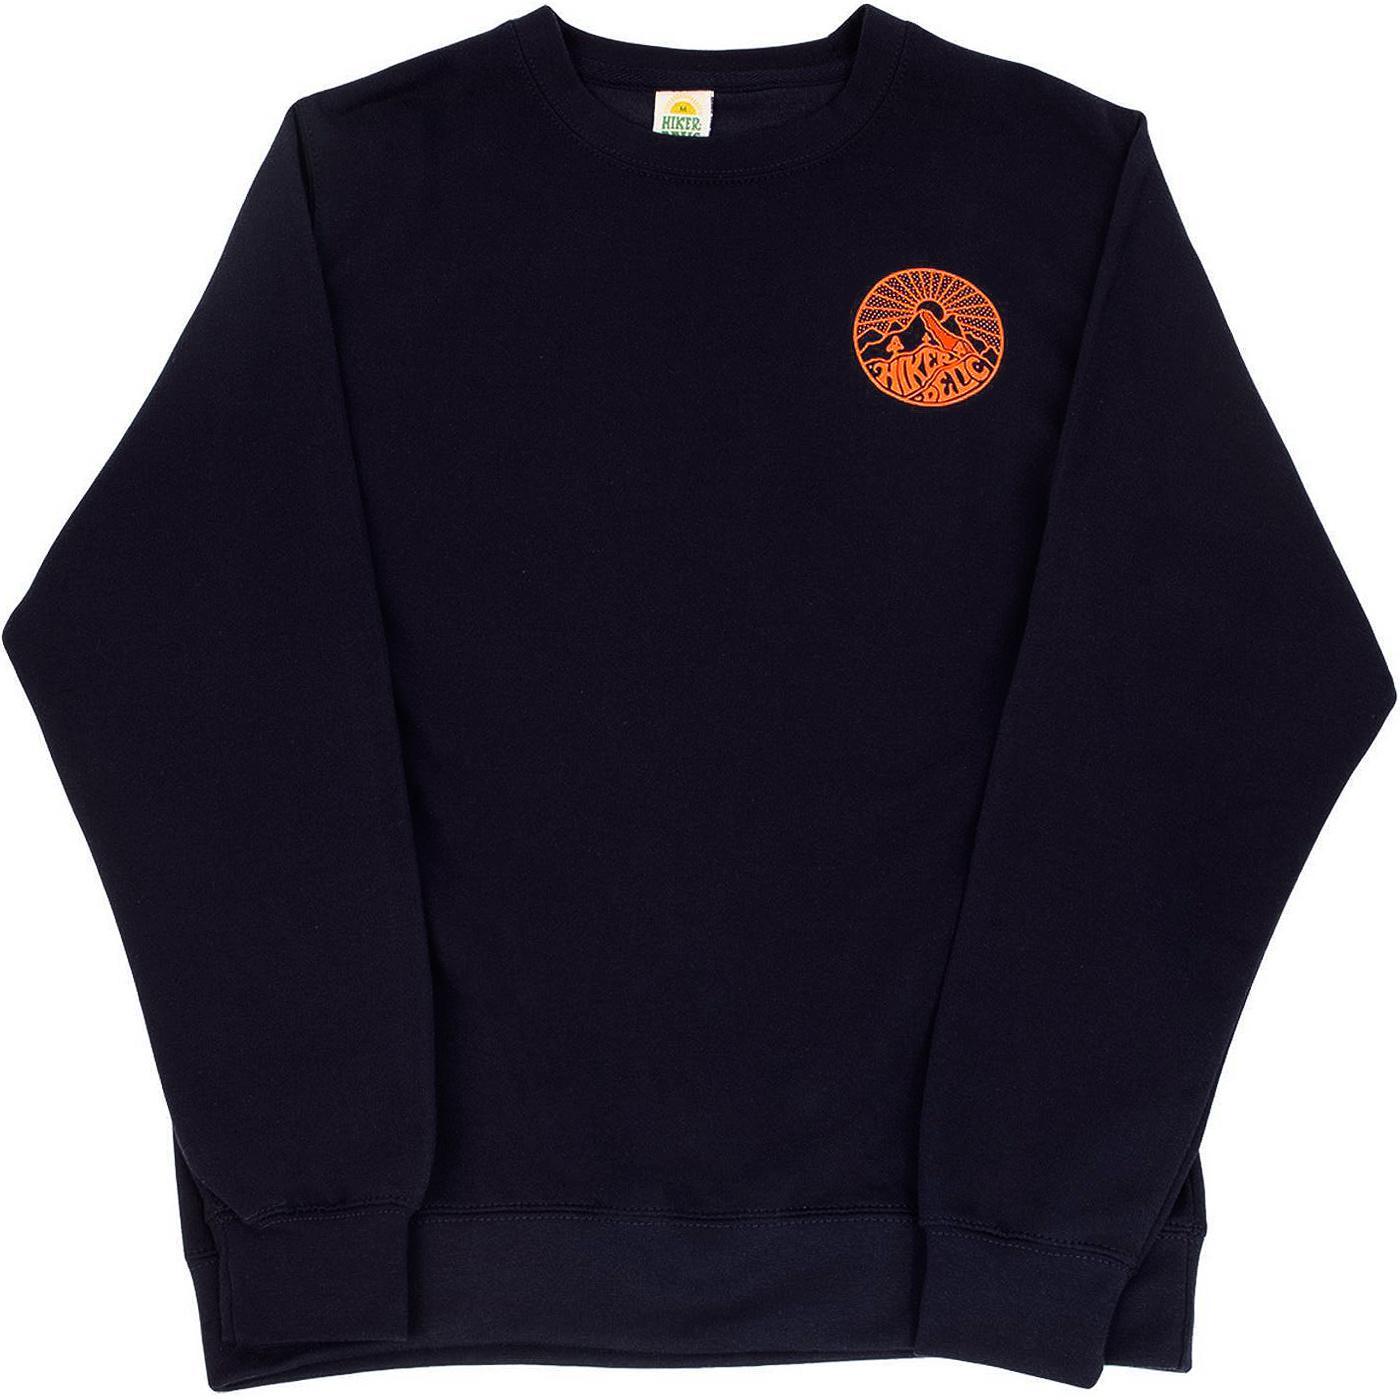 HIK2008 045 Core Sweatshirt